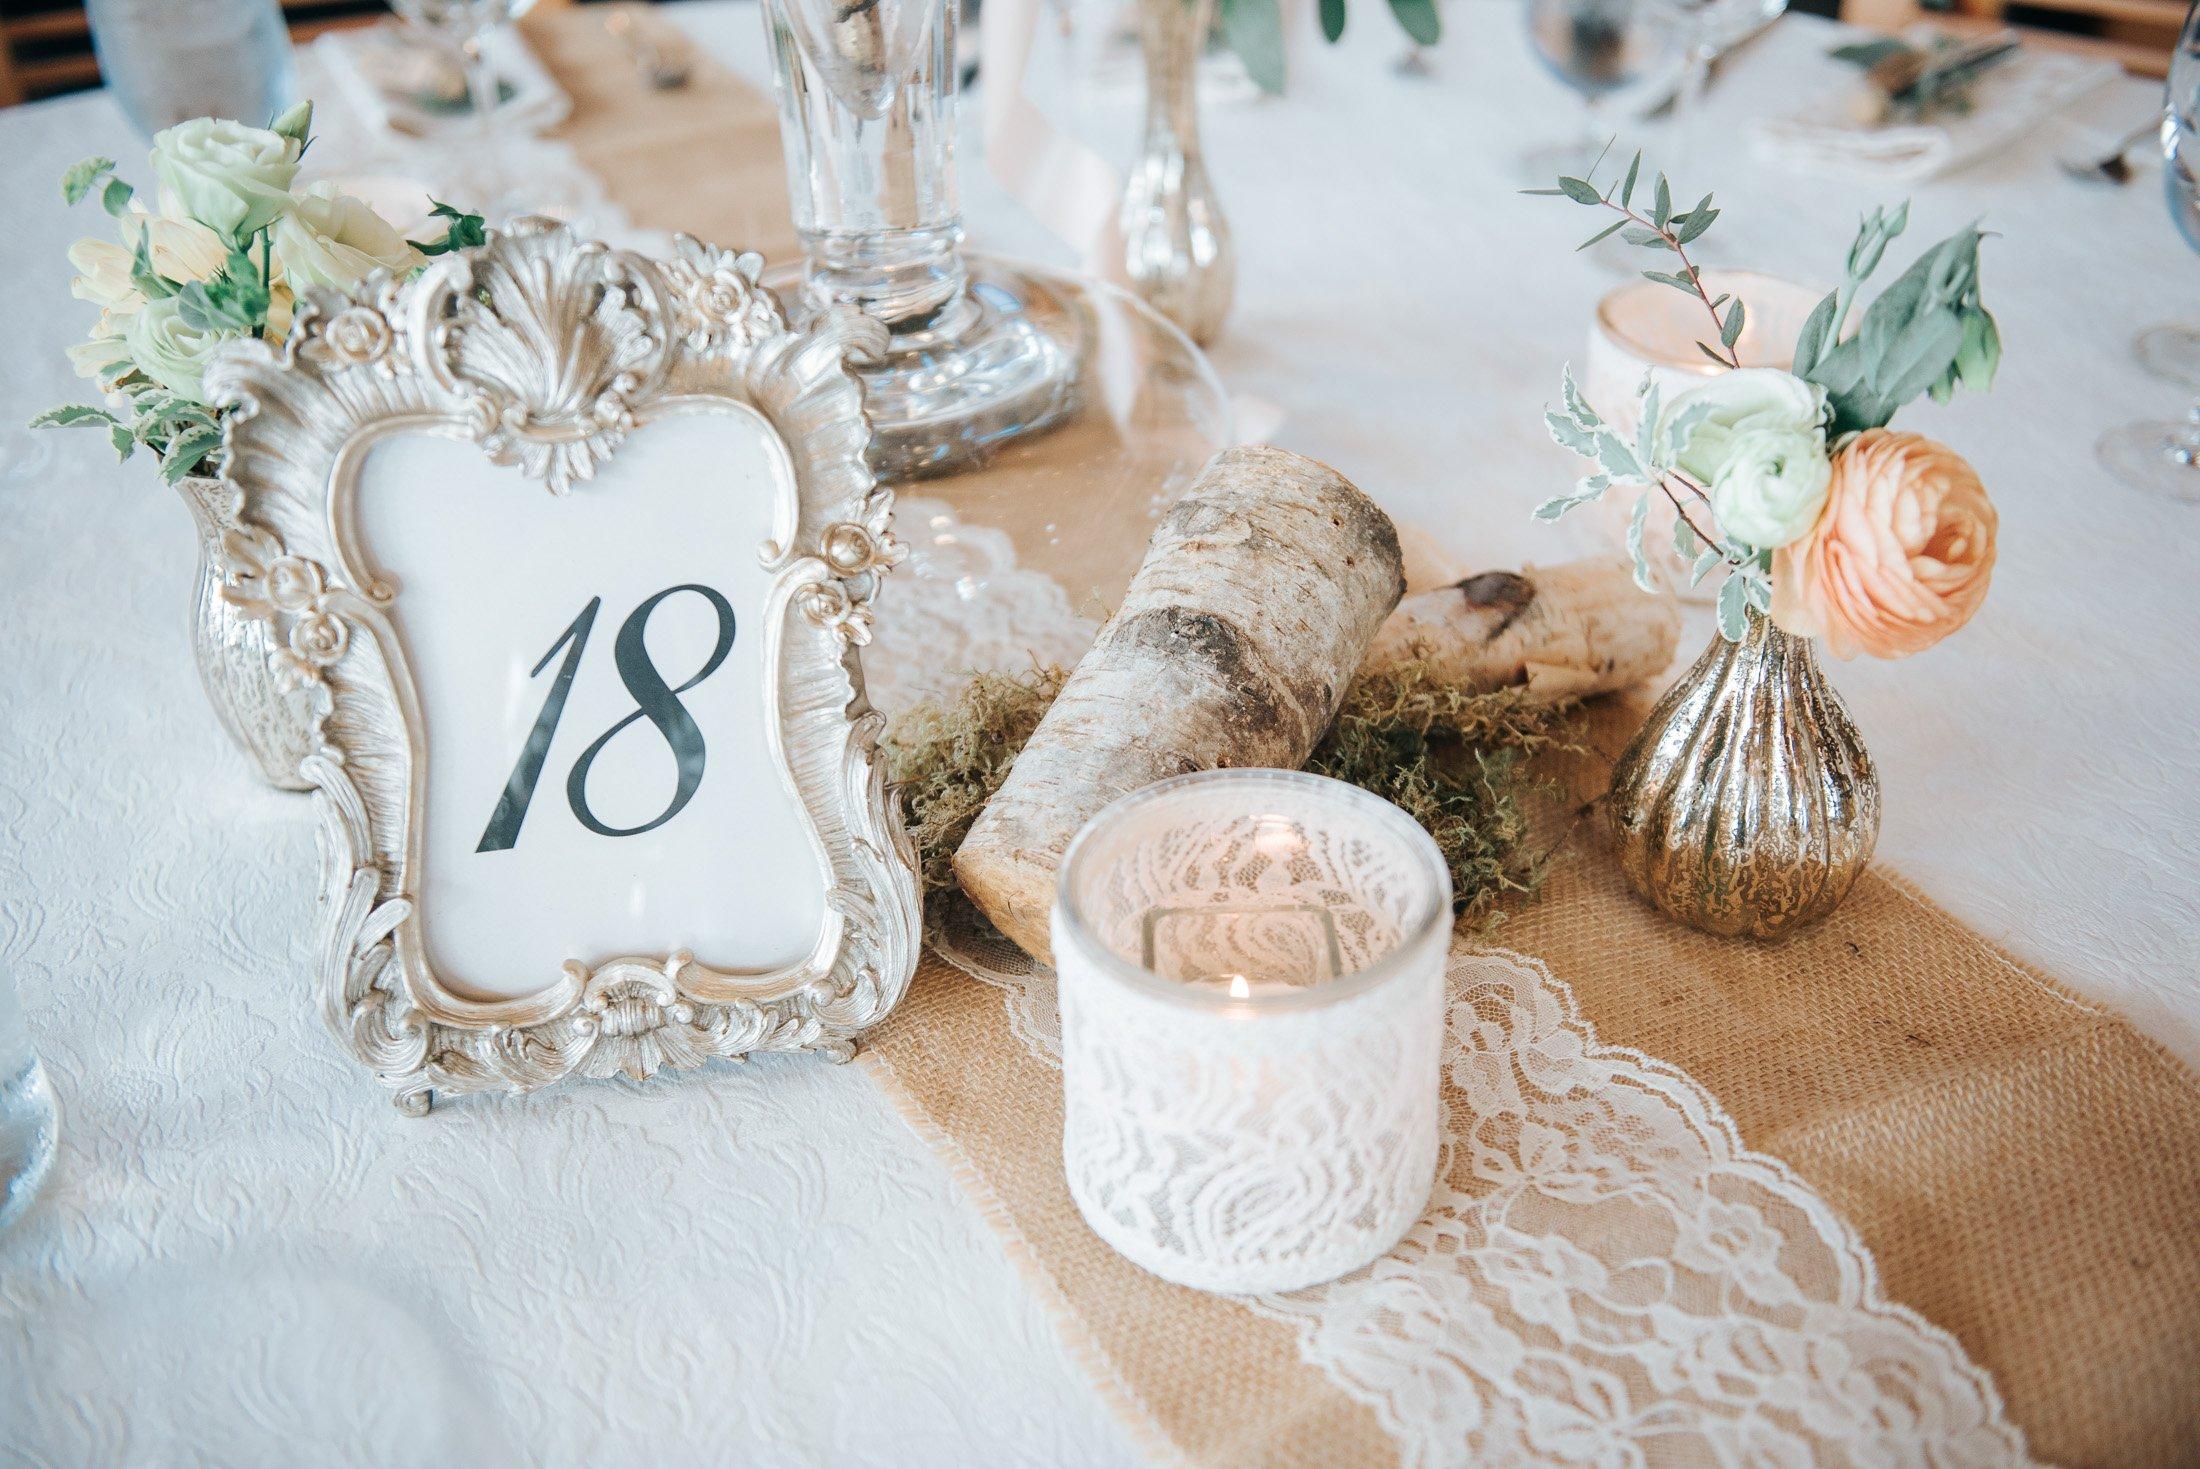 Vintage Wedding Gift Ideas - Eskayalitim